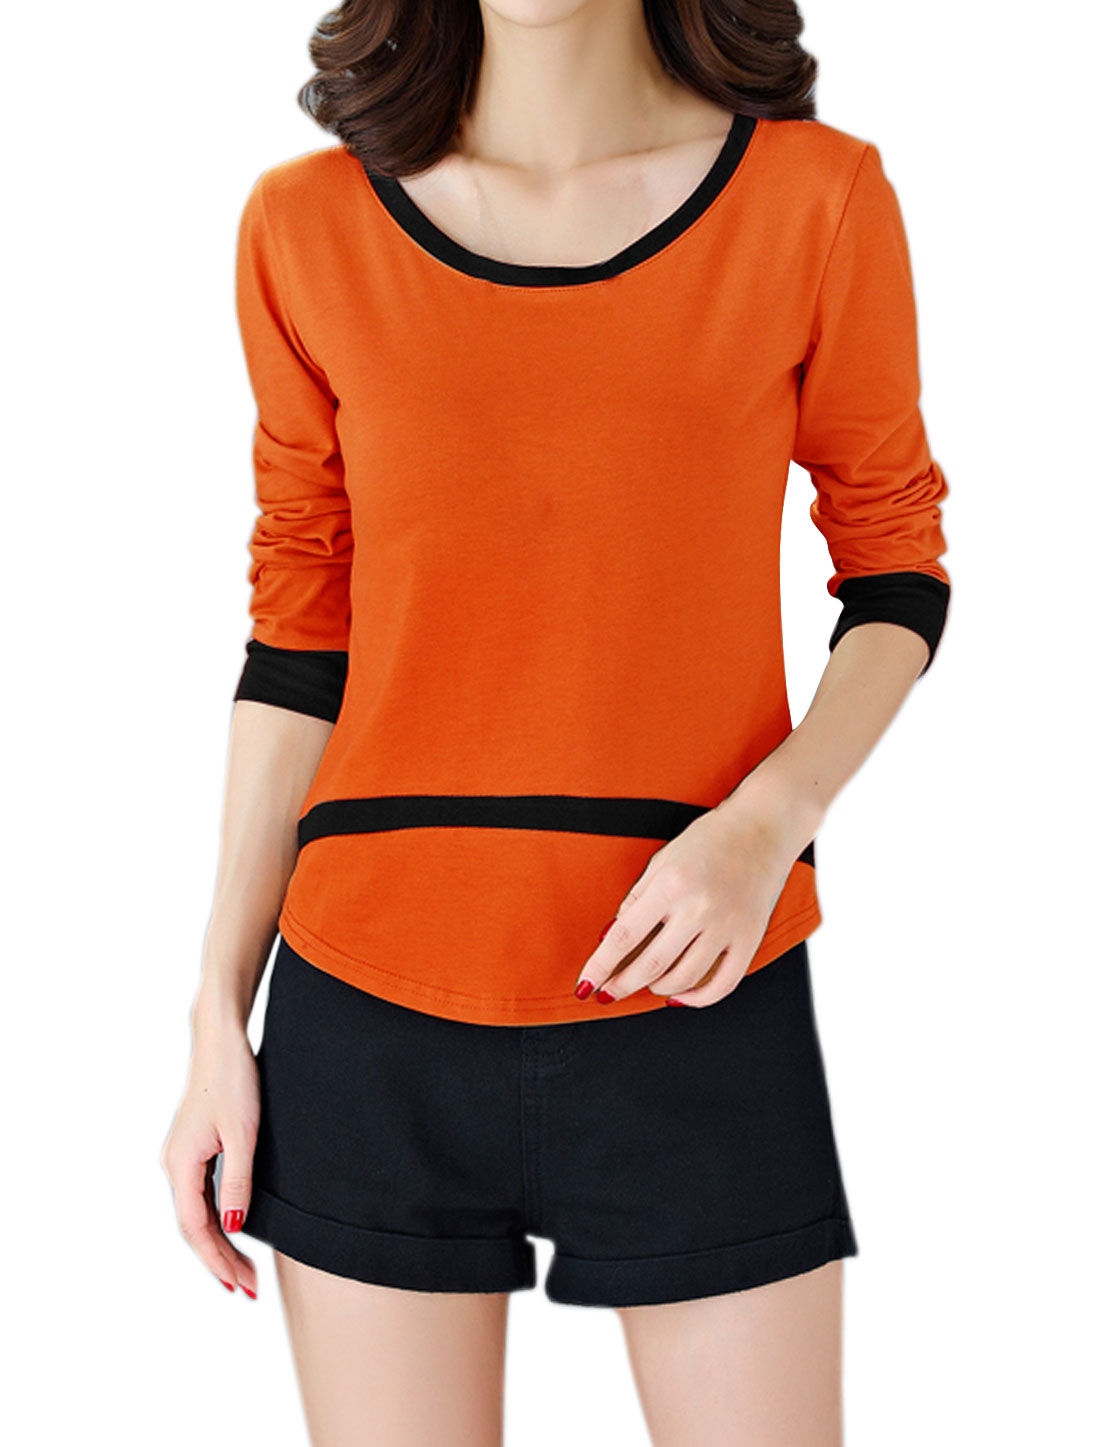 Women Long Sleeve Contrast Color Curved Hem Tee Orange M